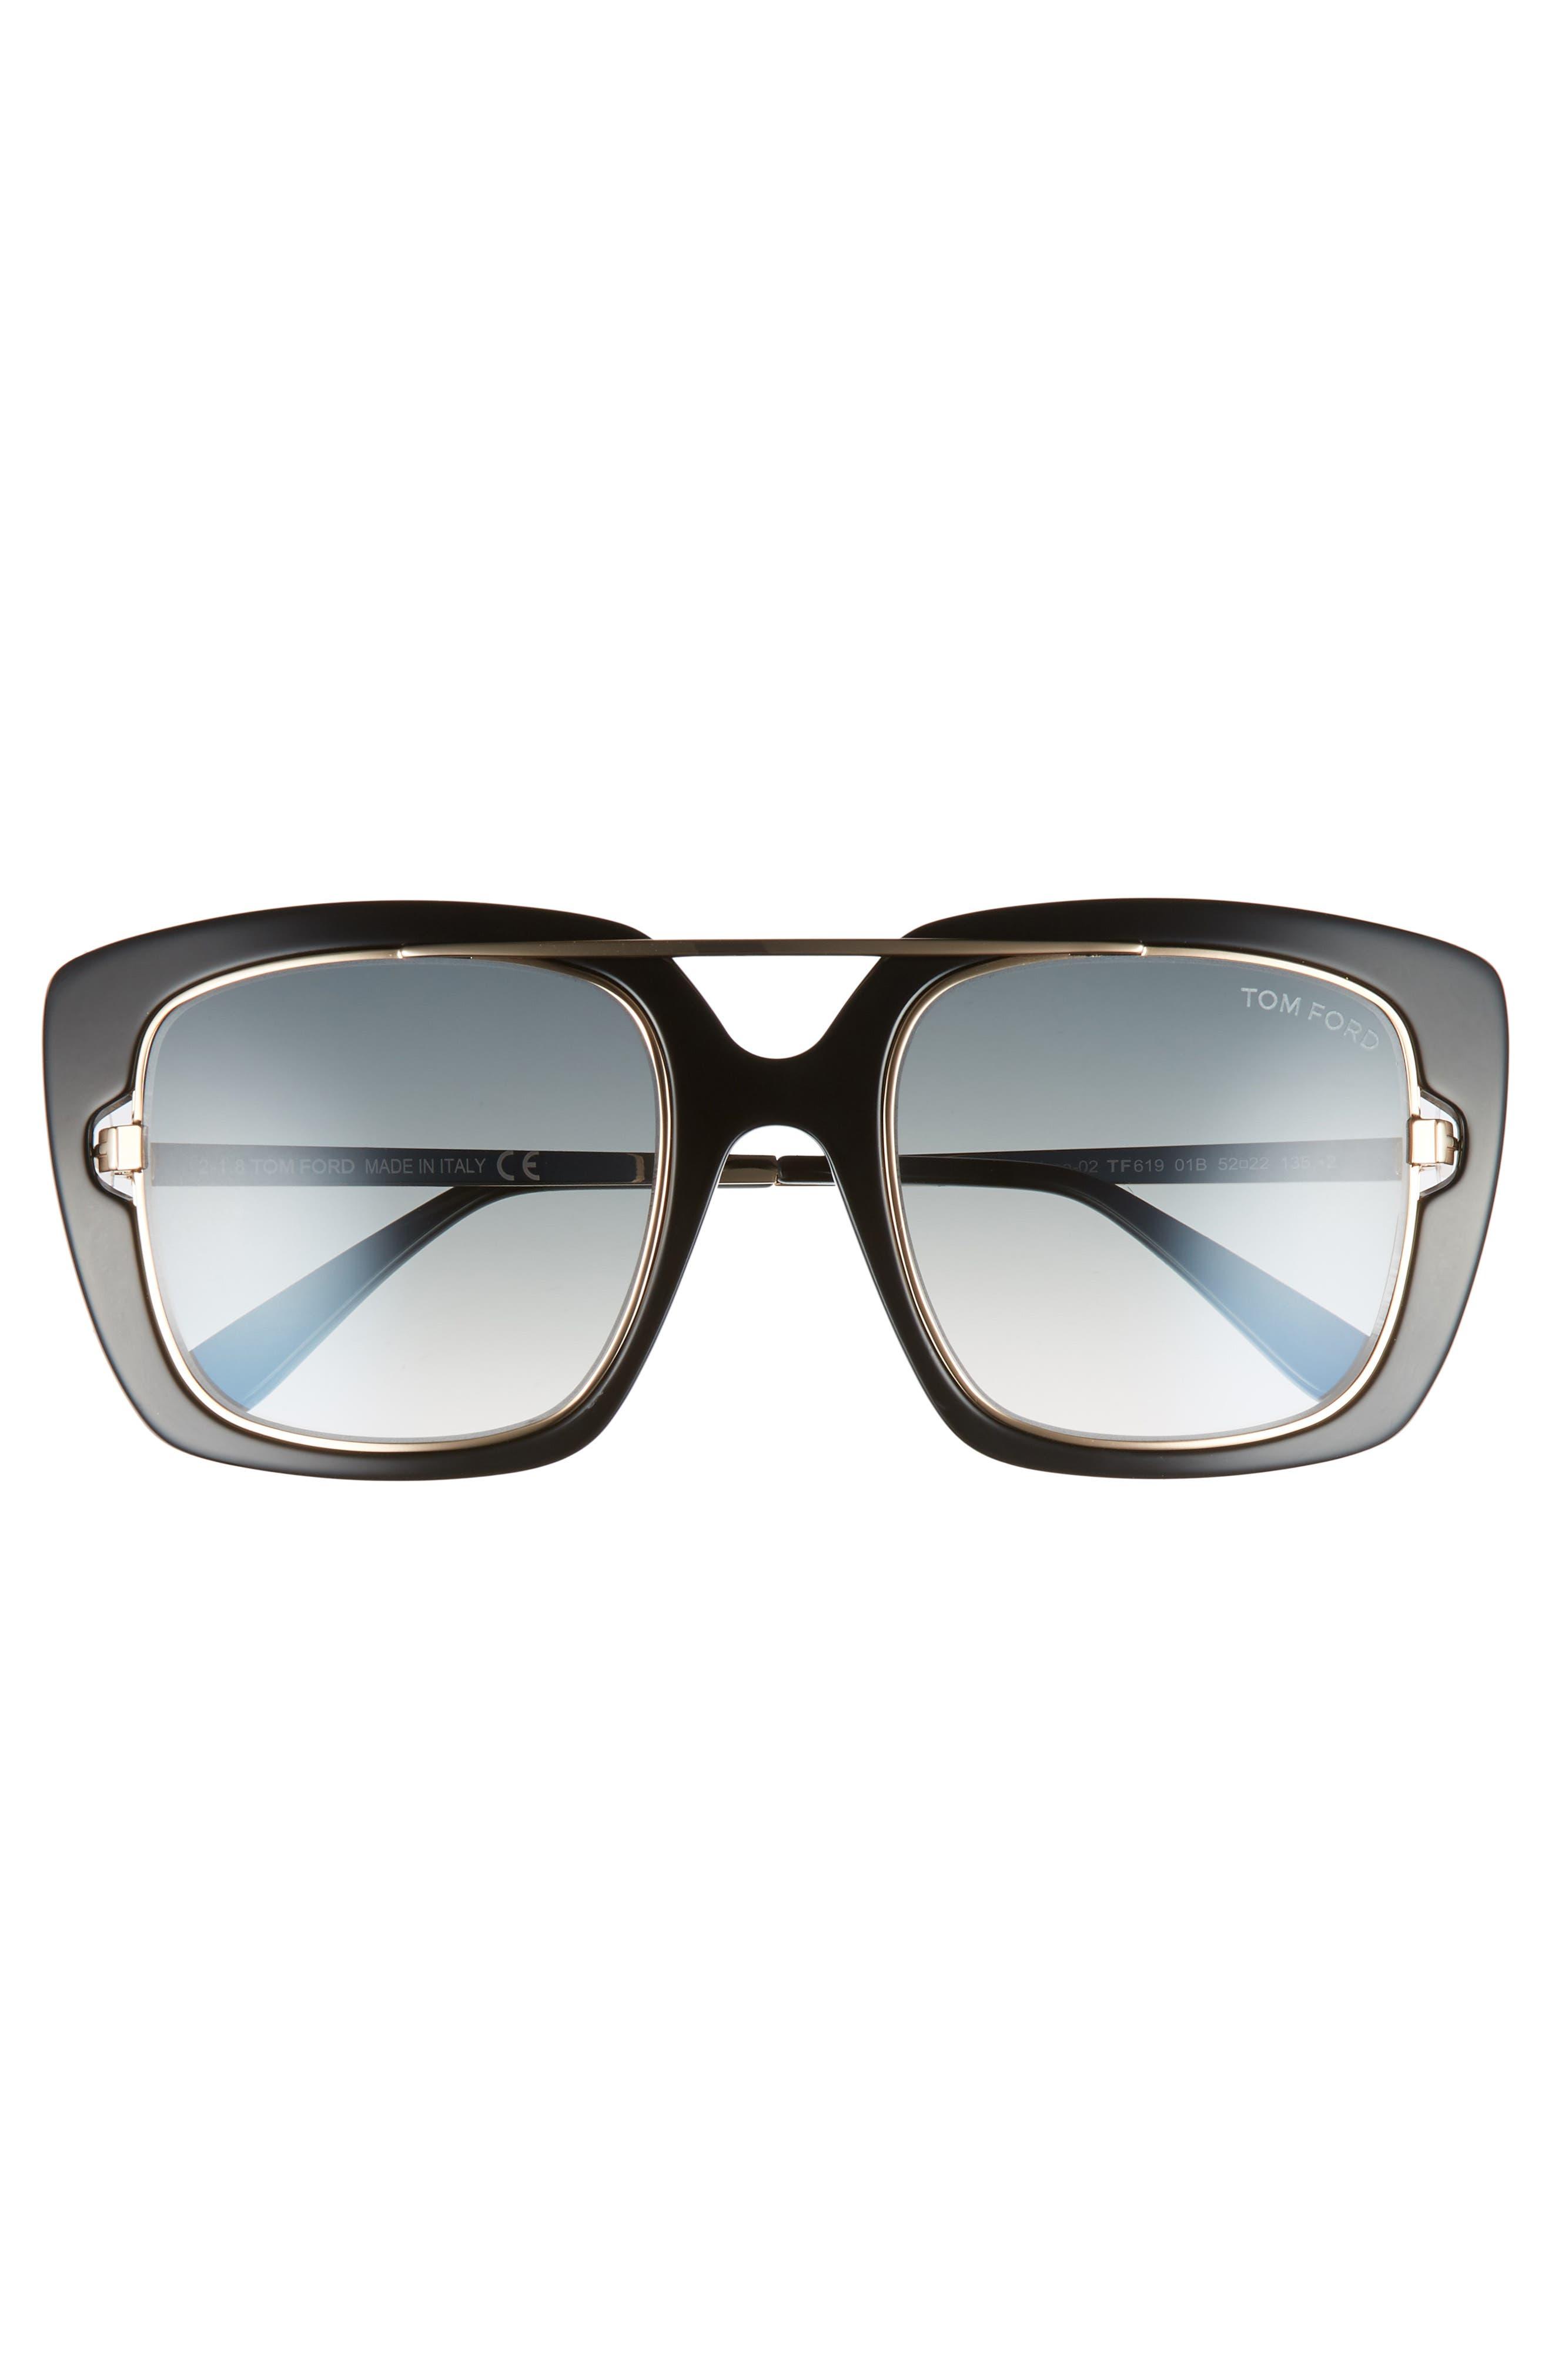 Marissa 52mm Sunglasses,                             Alternate thumbnail 3, color,                             Shiny Black/ Gradient Smoke